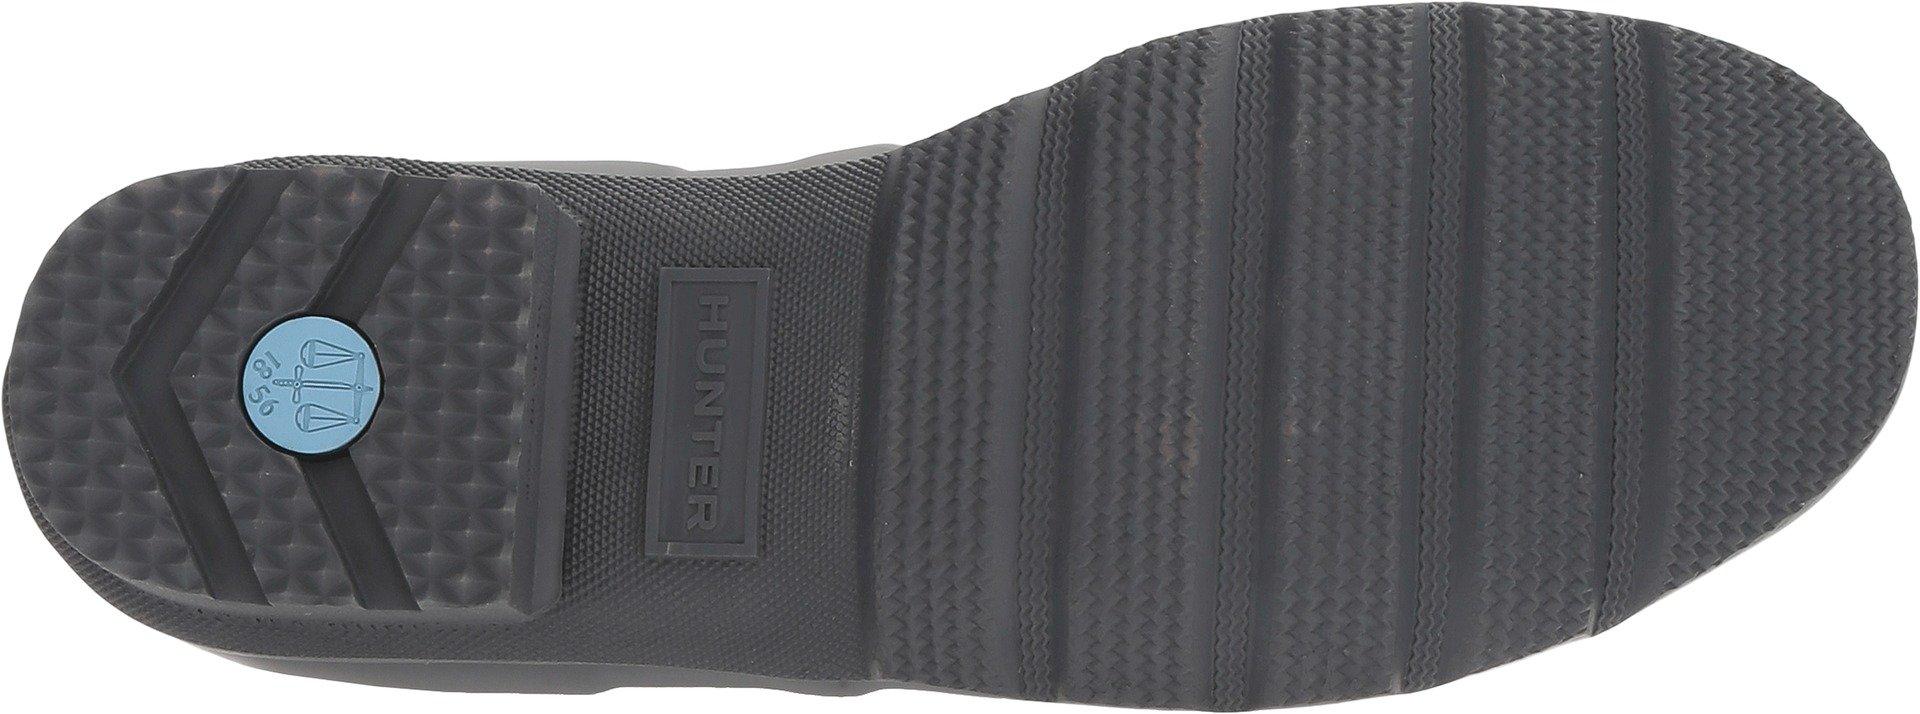 Hunter Men's Original Short Rain Boots Dark Slate 10 M US